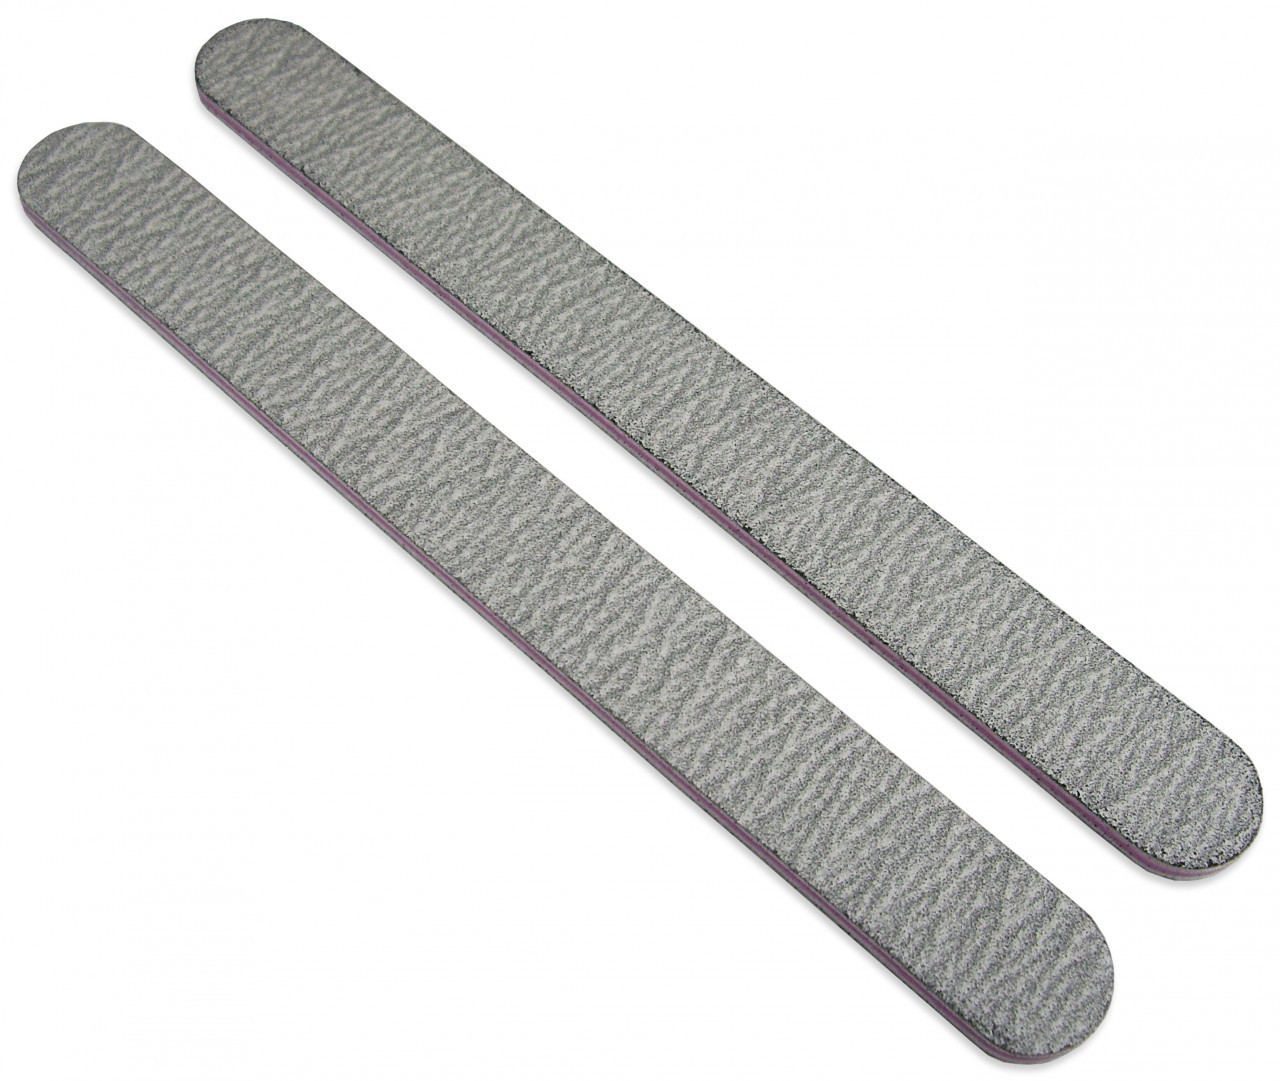 MEDIUM ROUND ZEBRA NAIL FILES - 80/80 GRIT (50pcs) - Diamond Nail ...